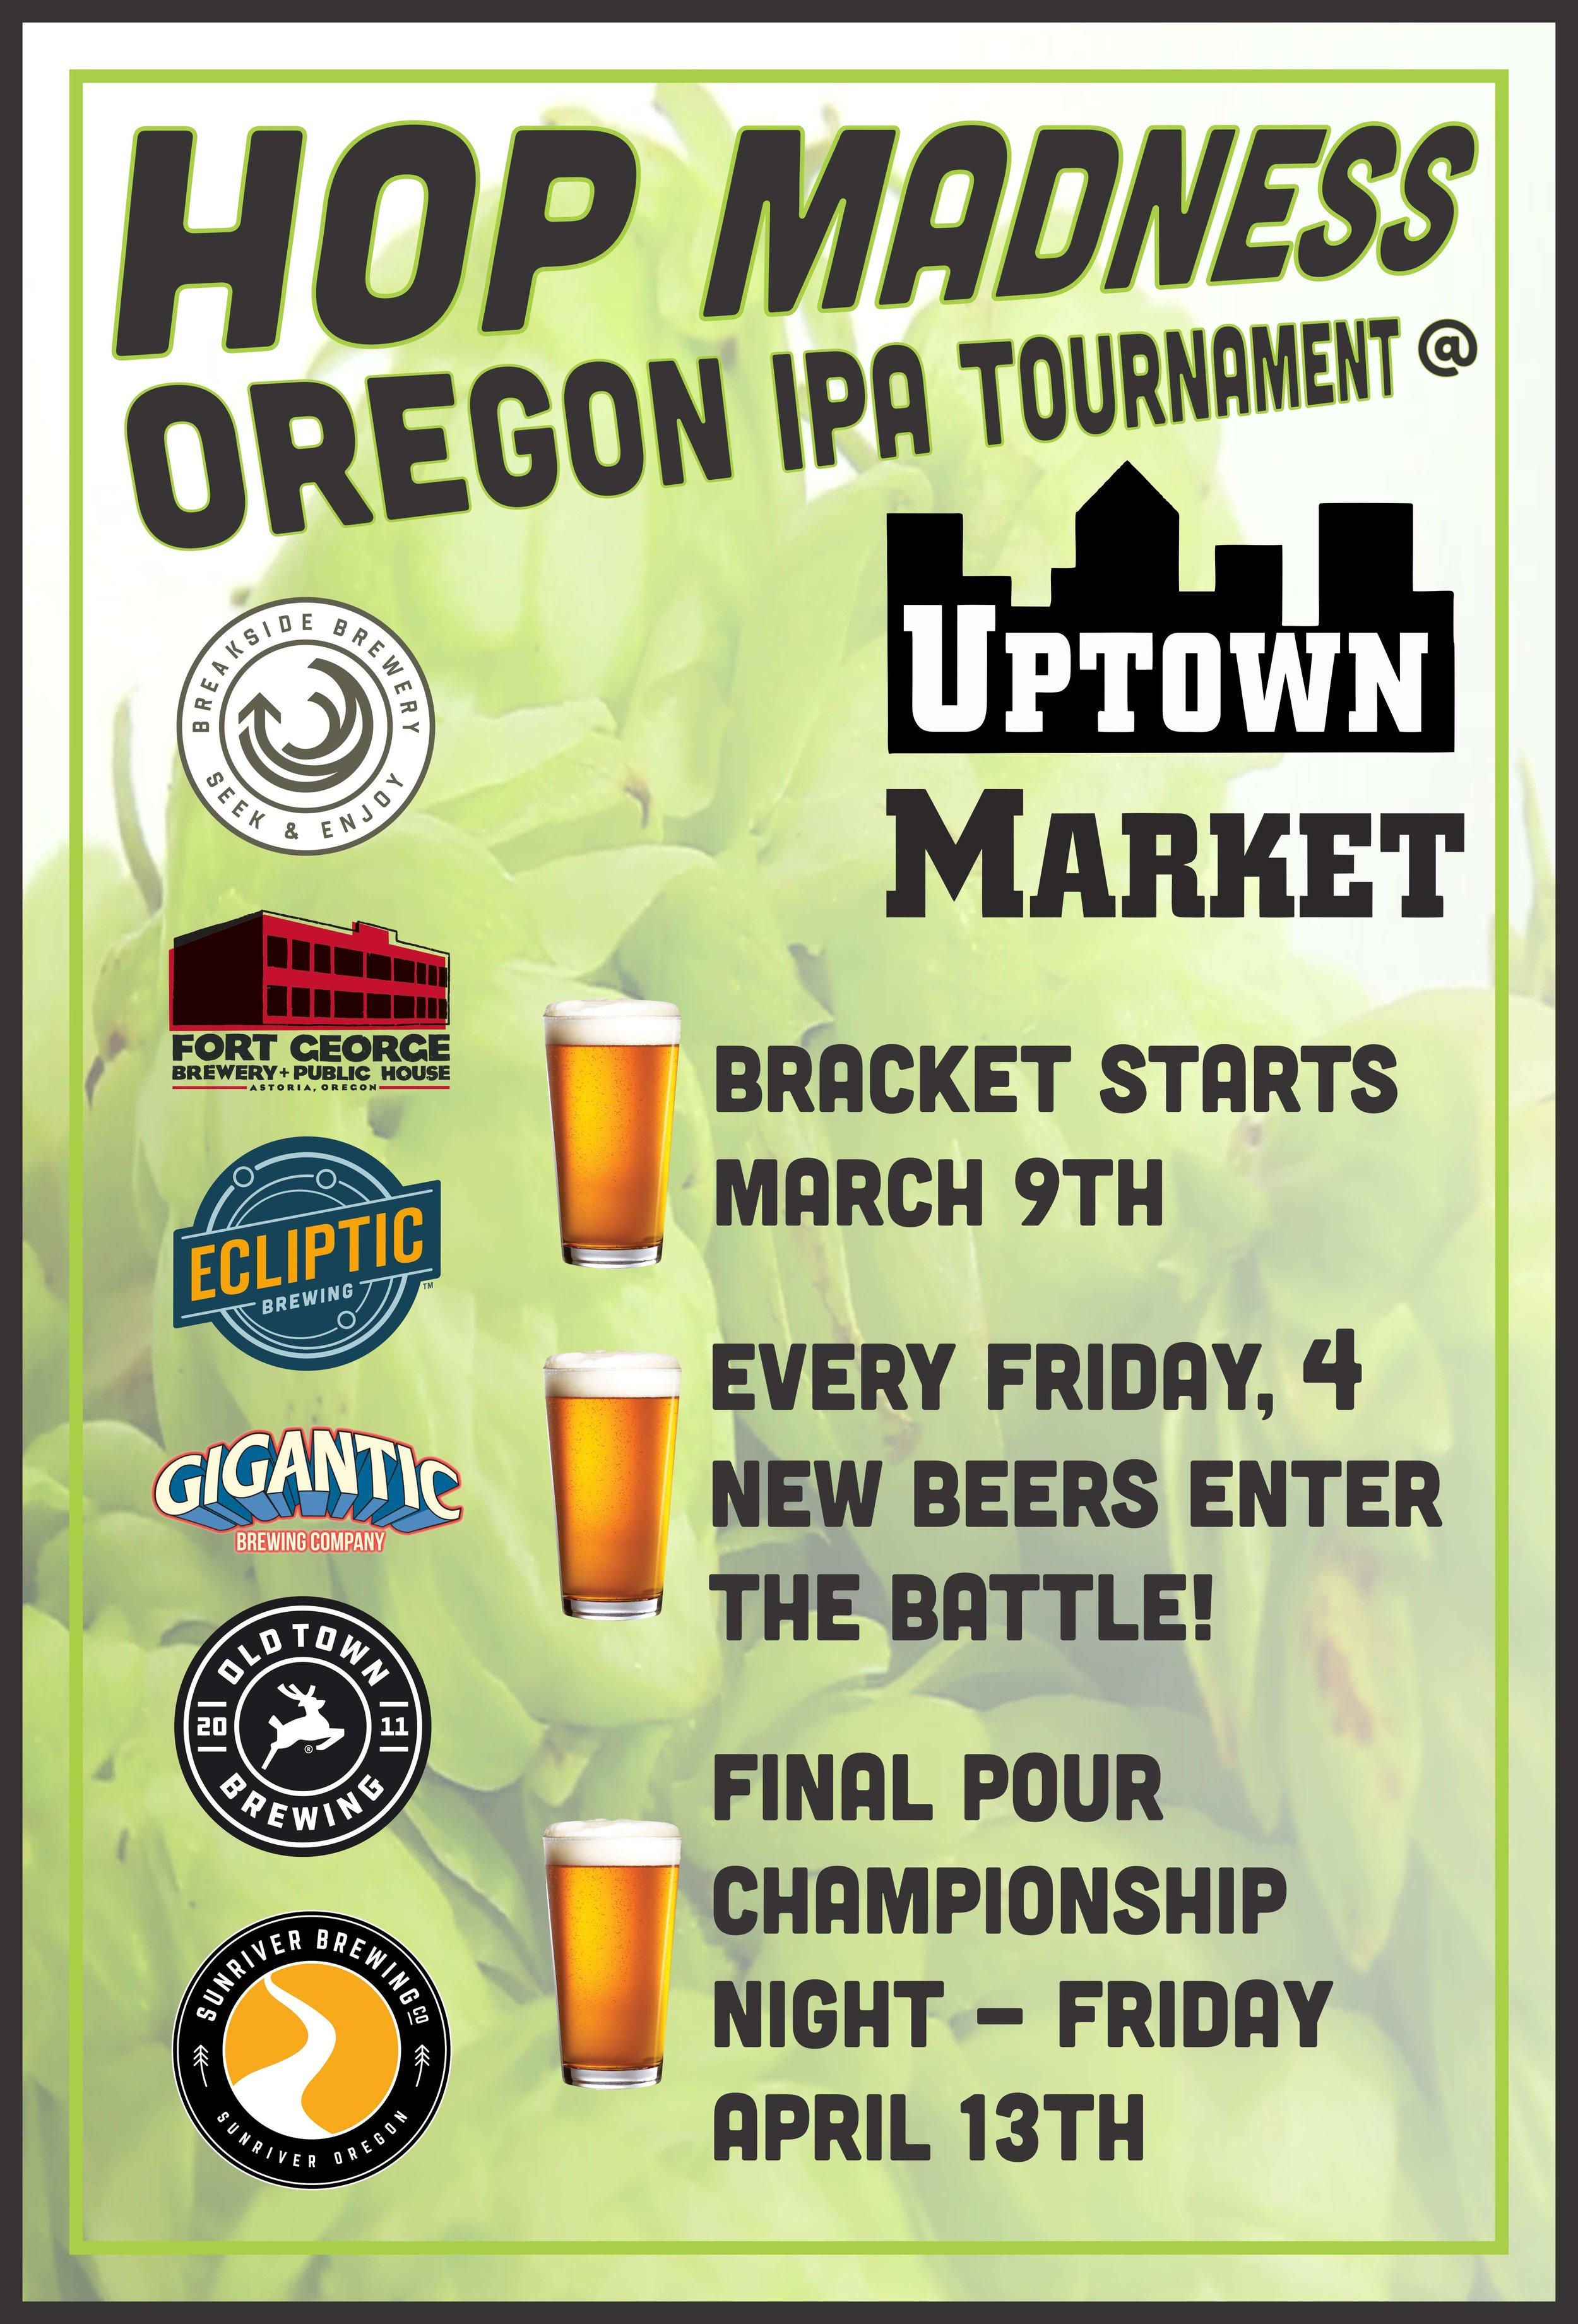 Hop Madness Oregon IPA Tournament 2018 - Uptown Market.jpg